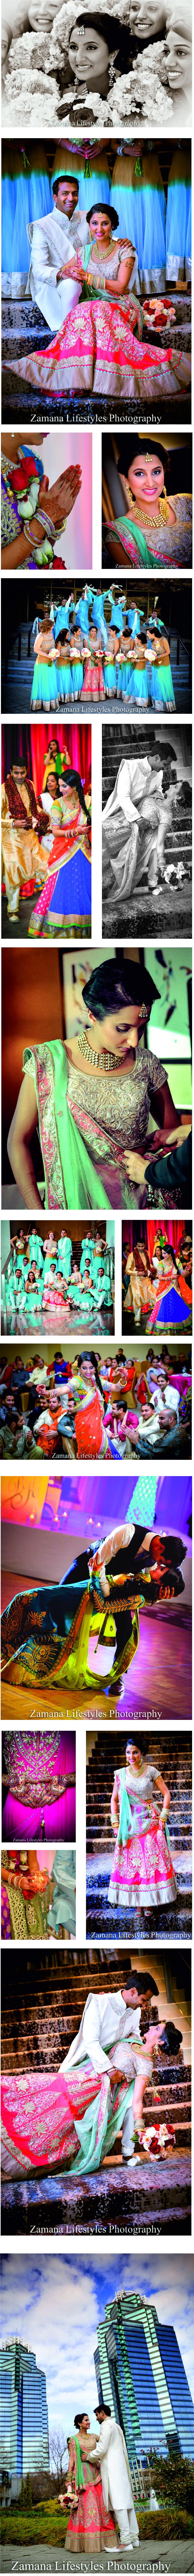 Priya_Kunal_Zamana_Photo_&_Videography